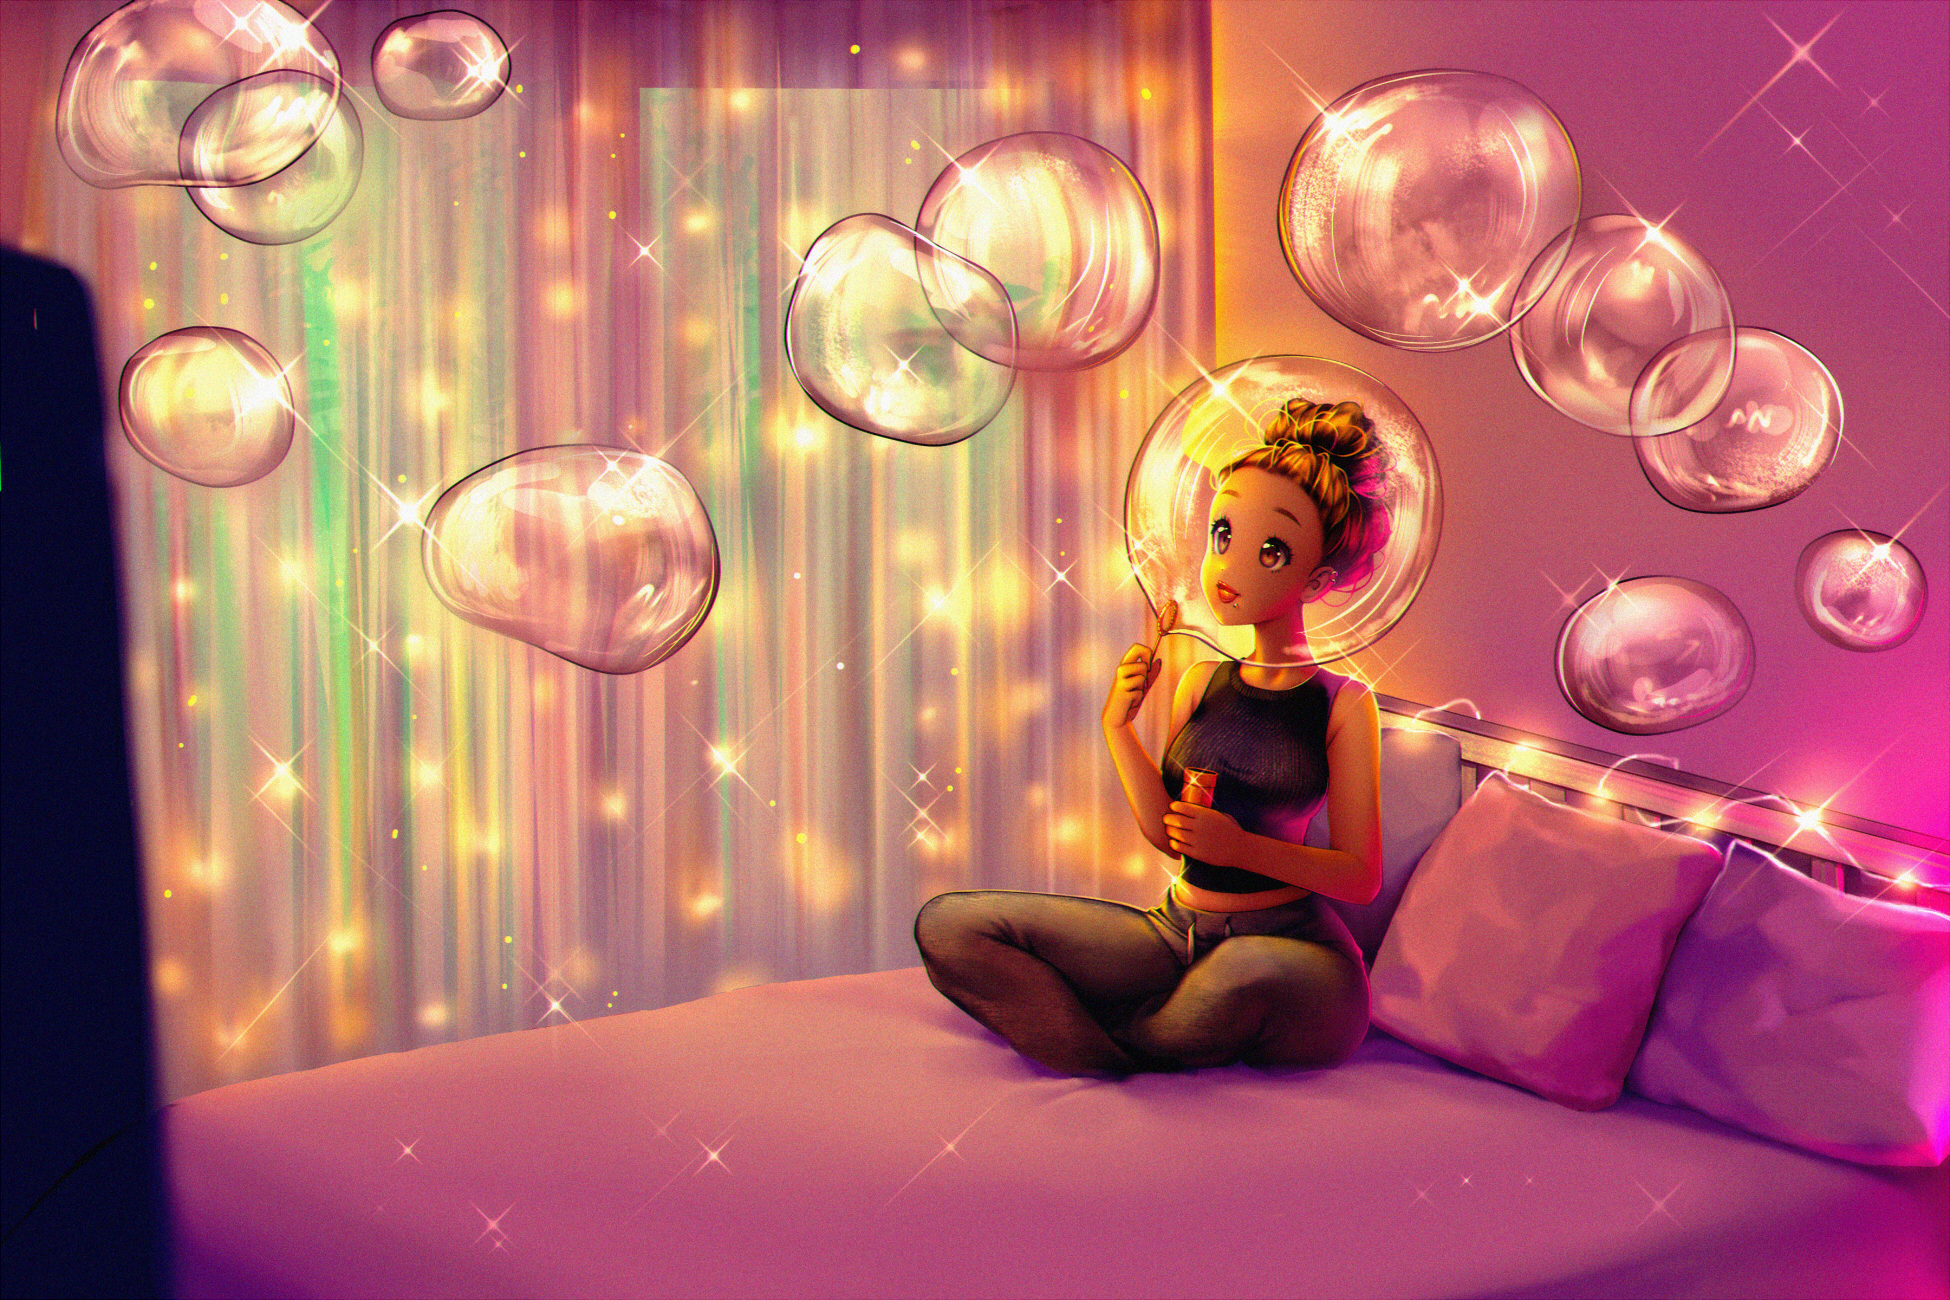 Bubble Girl Woman 1950x1300